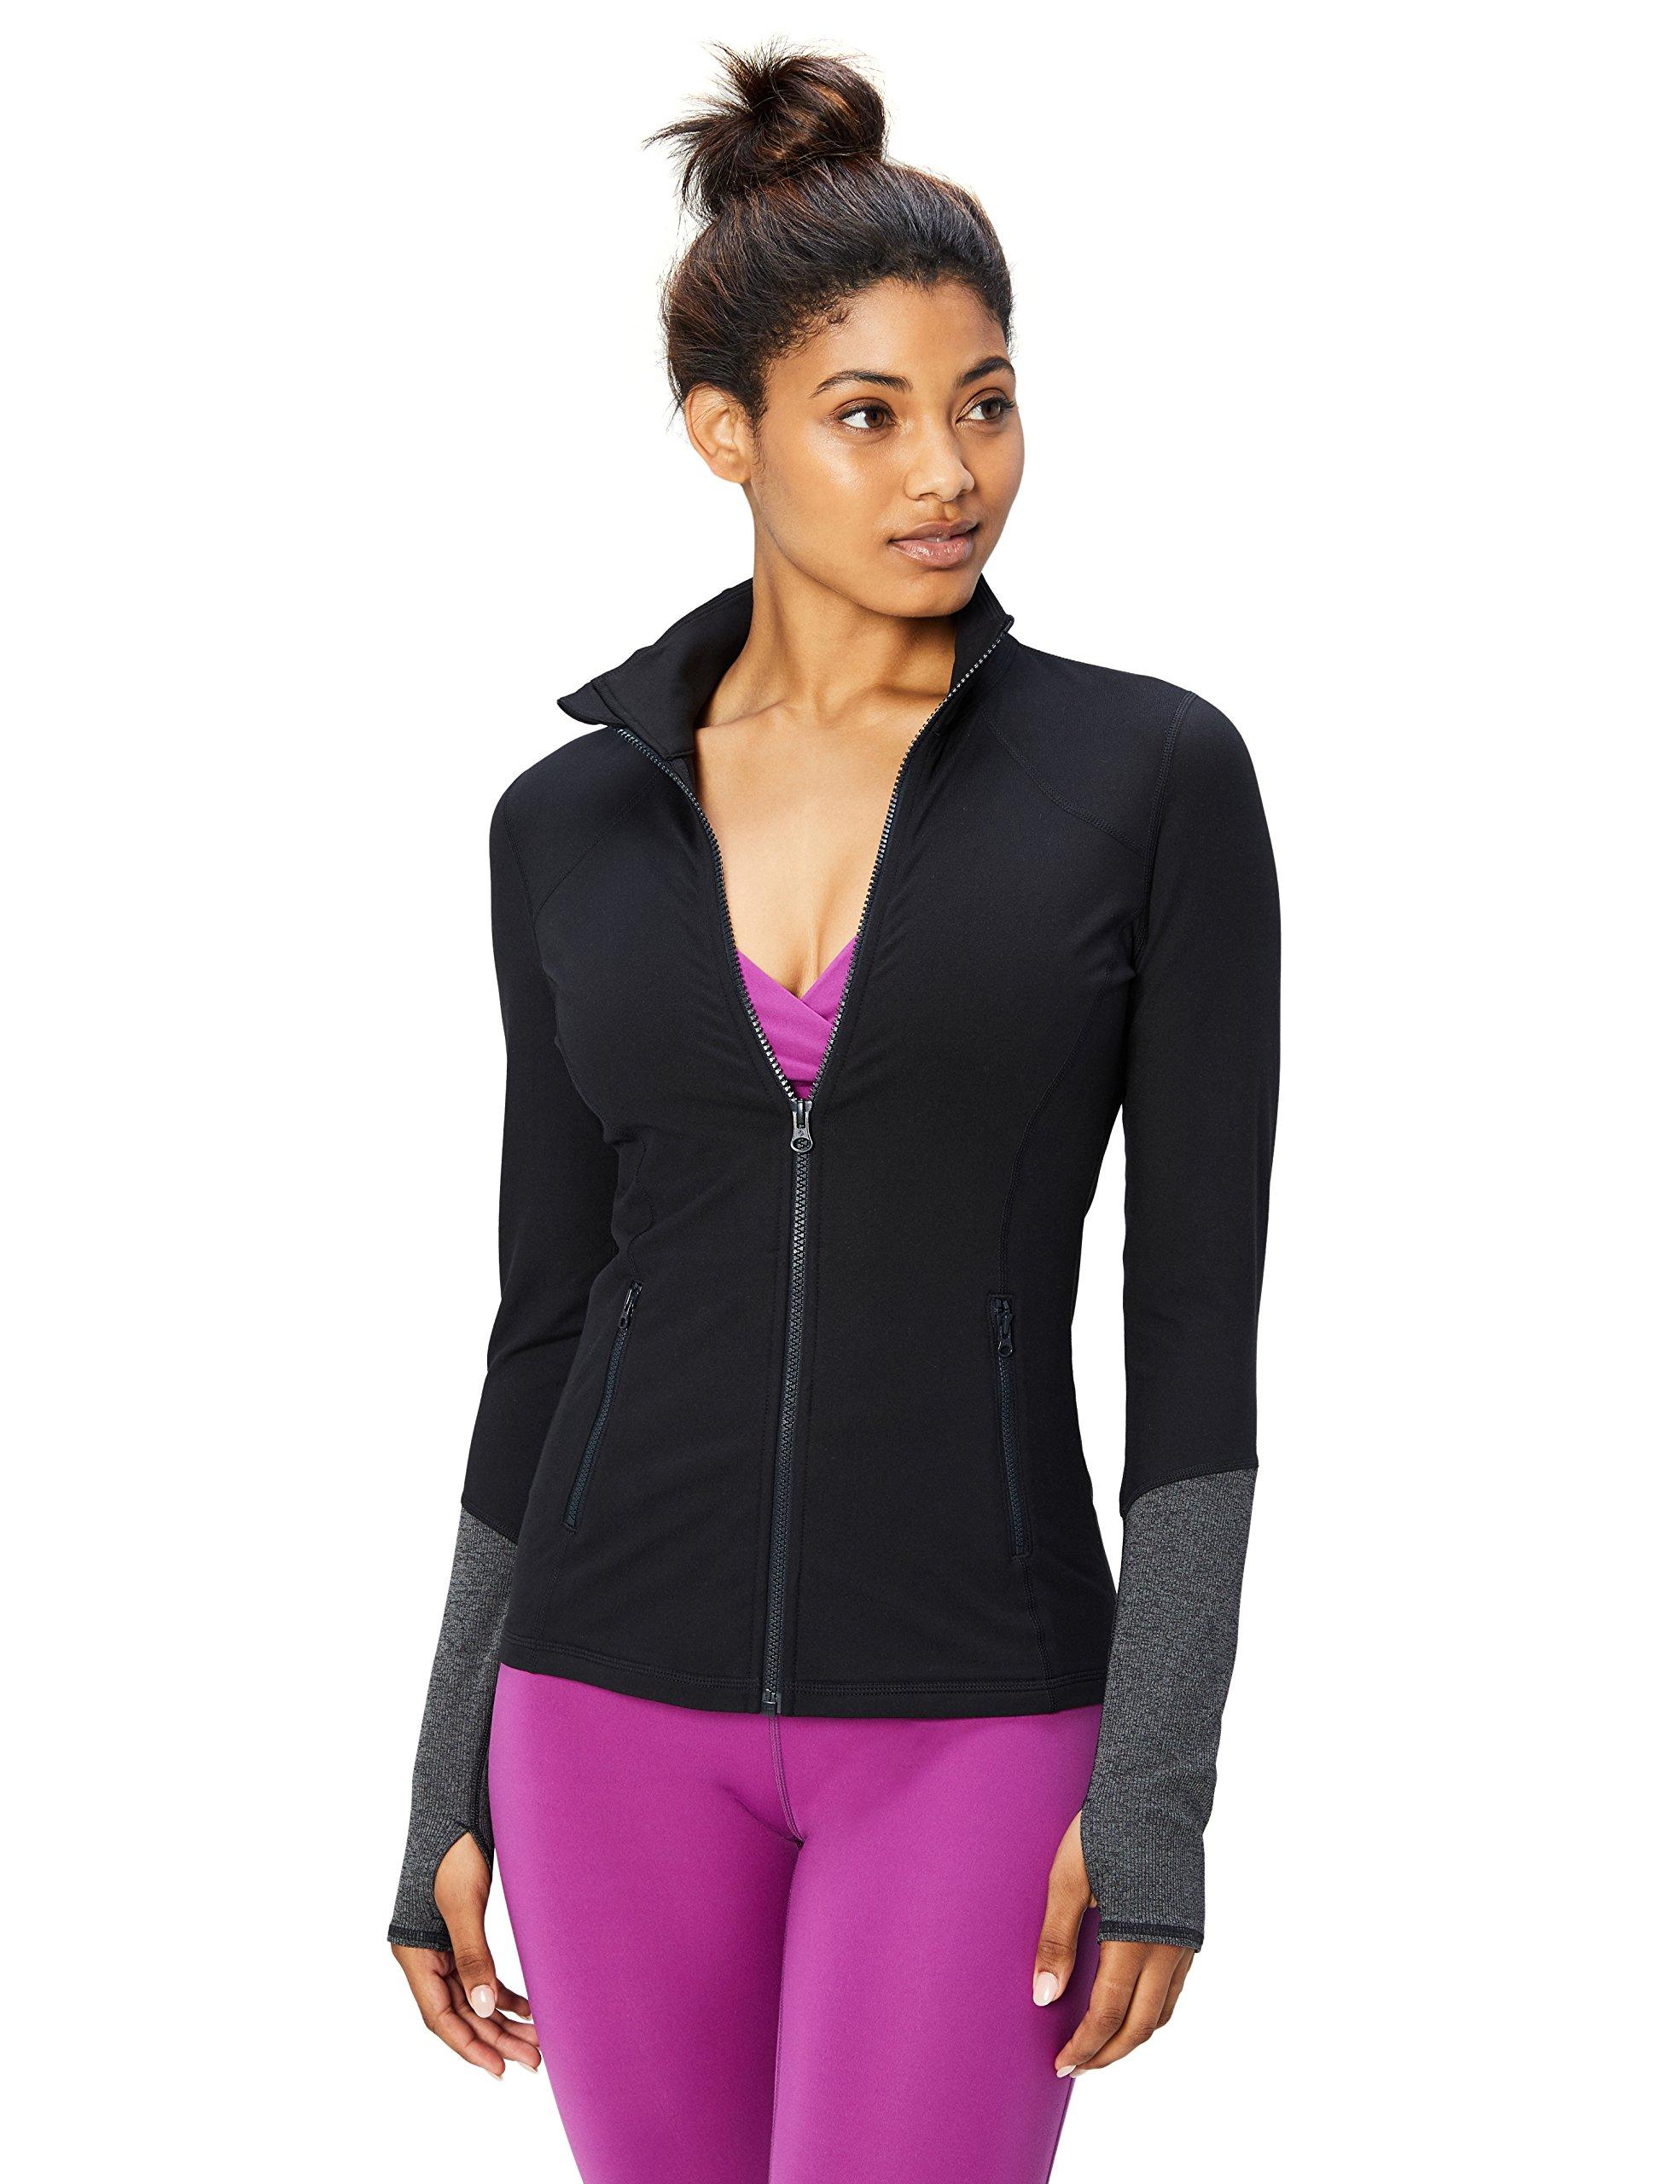 Core 10 Women's Icon Series - The Ballerina Full-Zip Jacket, Black, X-Large